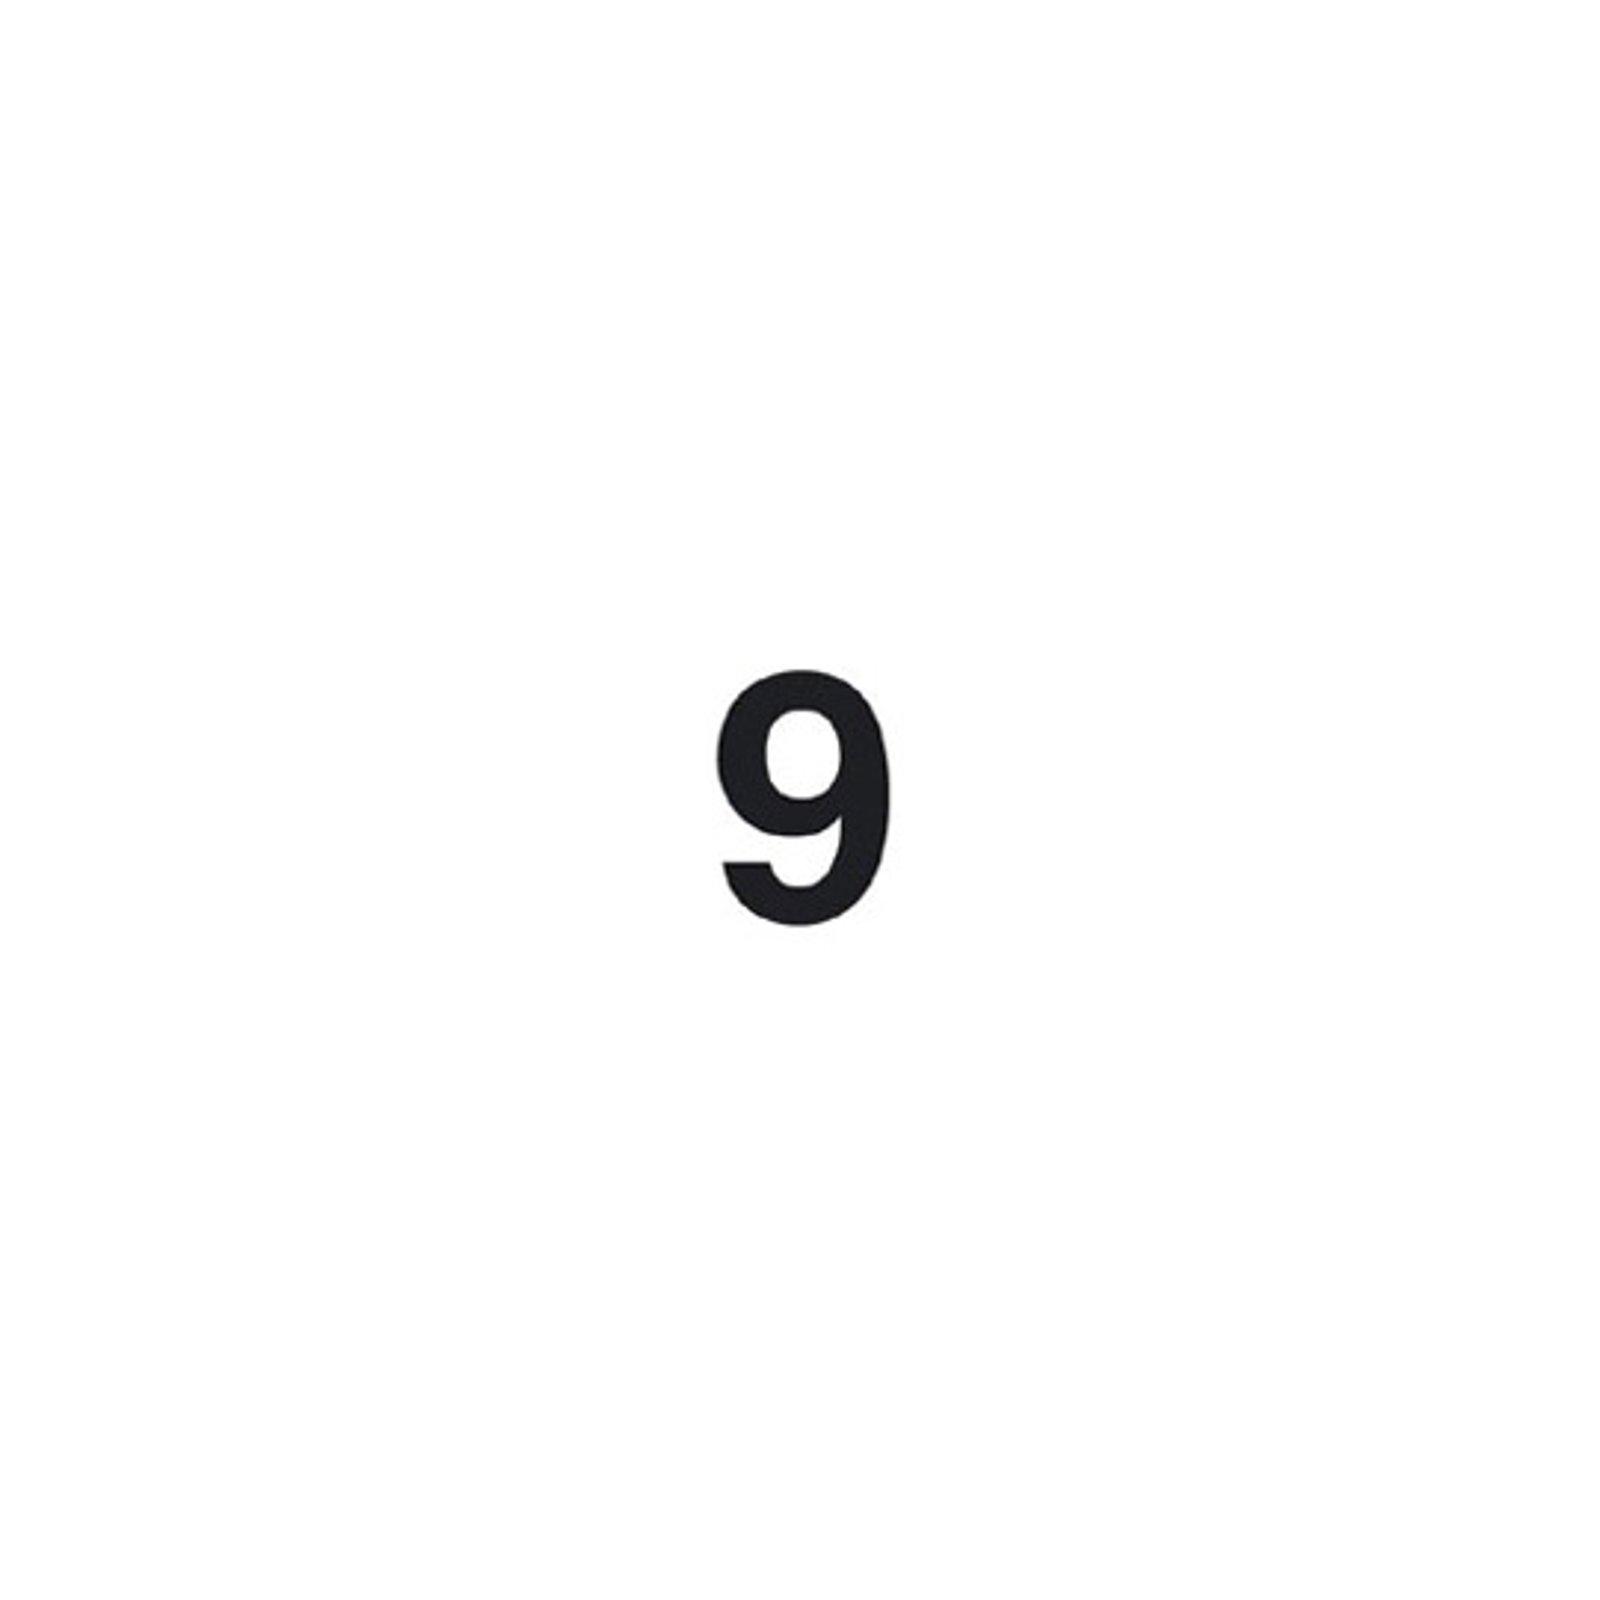 Selvklebende tallet 9